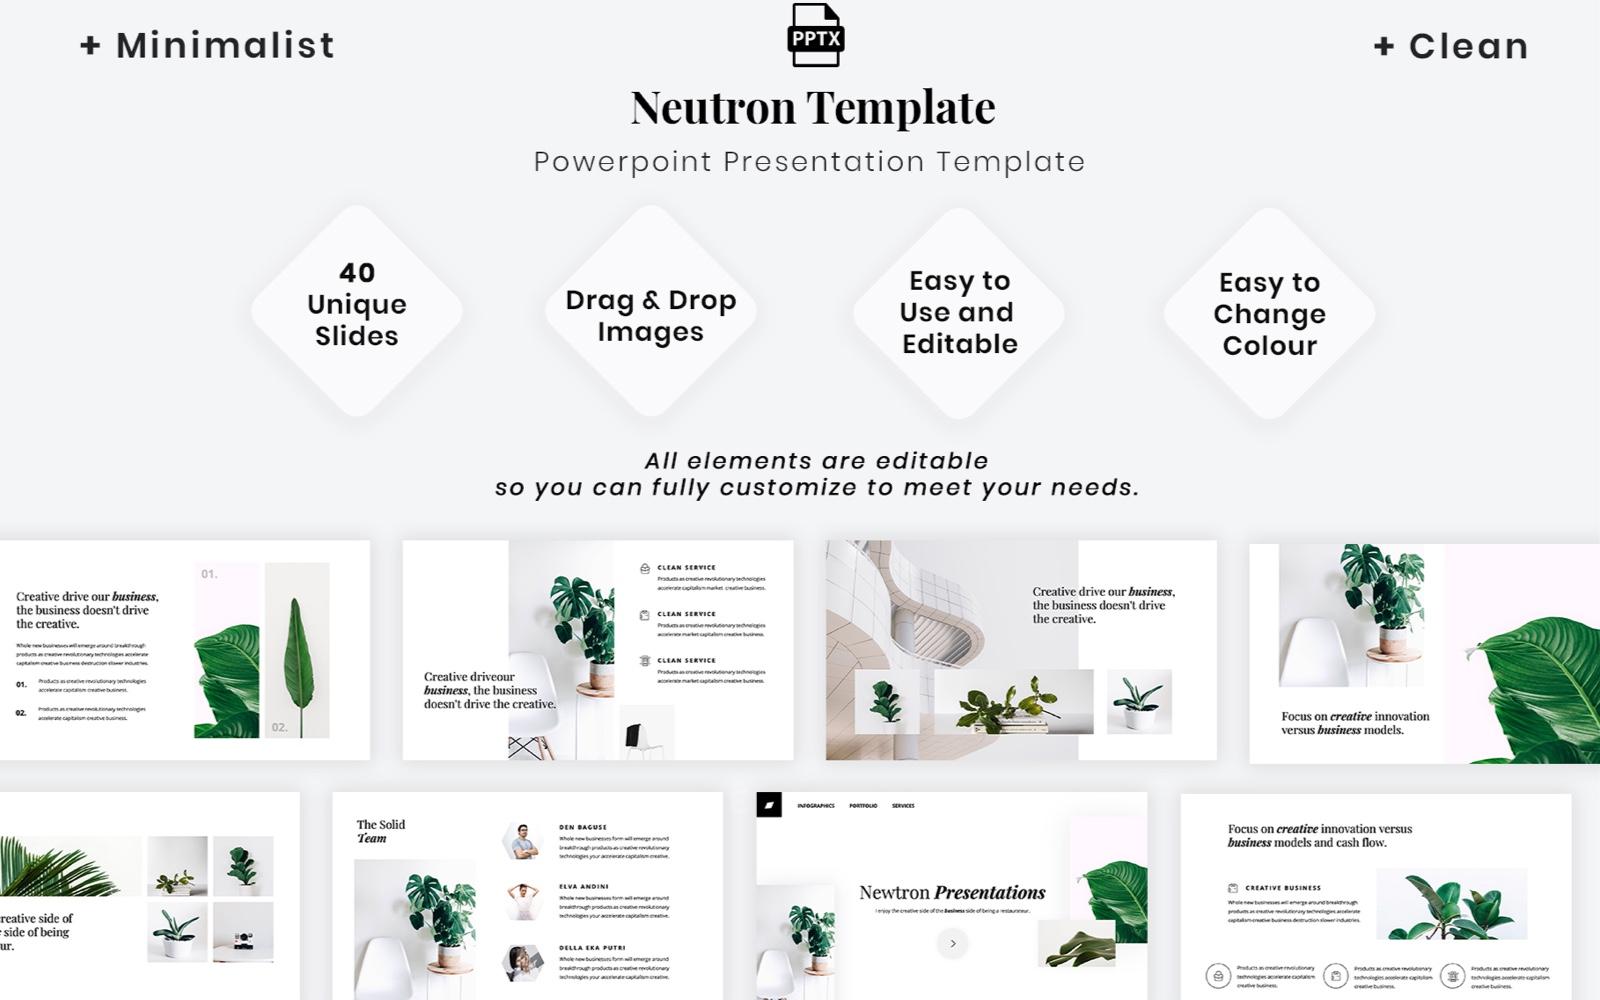 Minimalist - Clean Presentation Template PowerPoint №102229